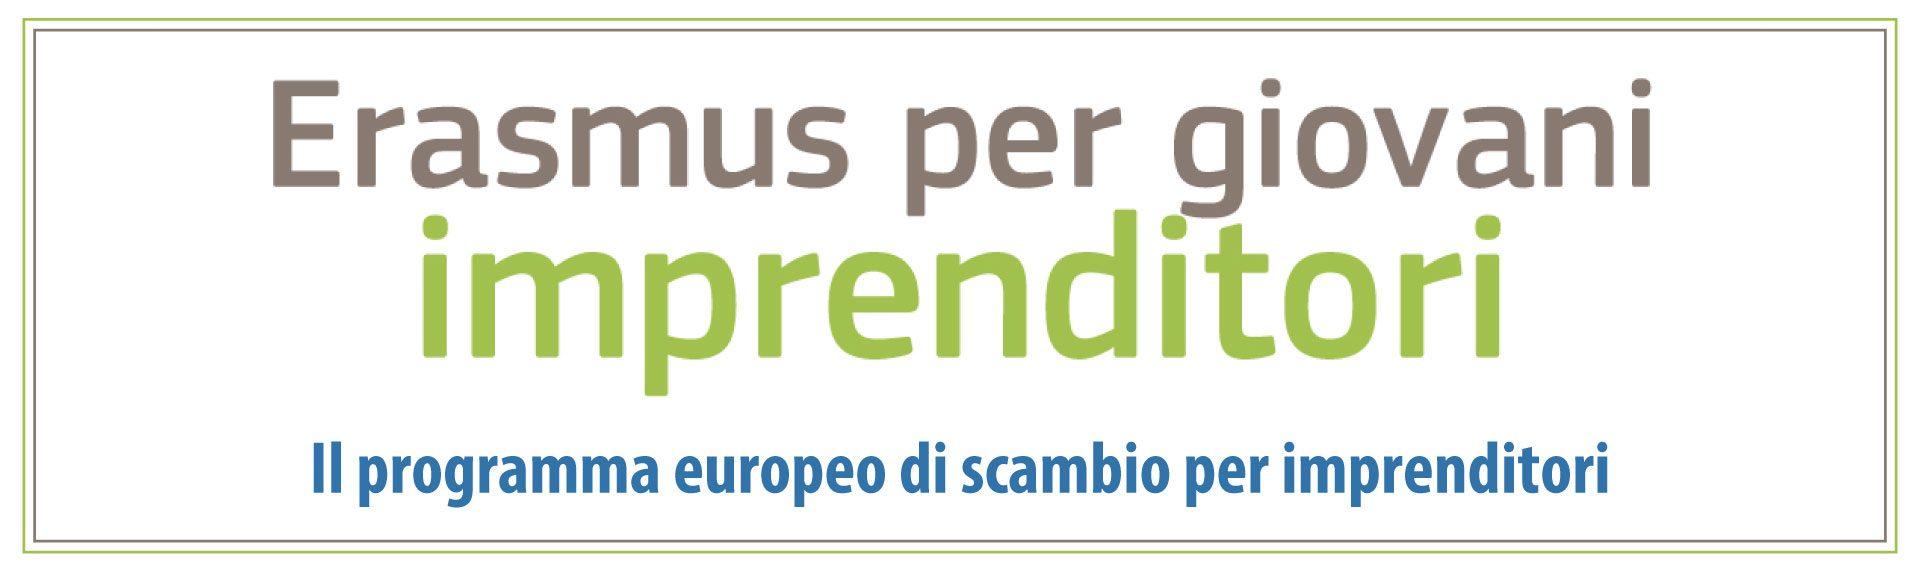 Erasmus per i giovani imprenditori